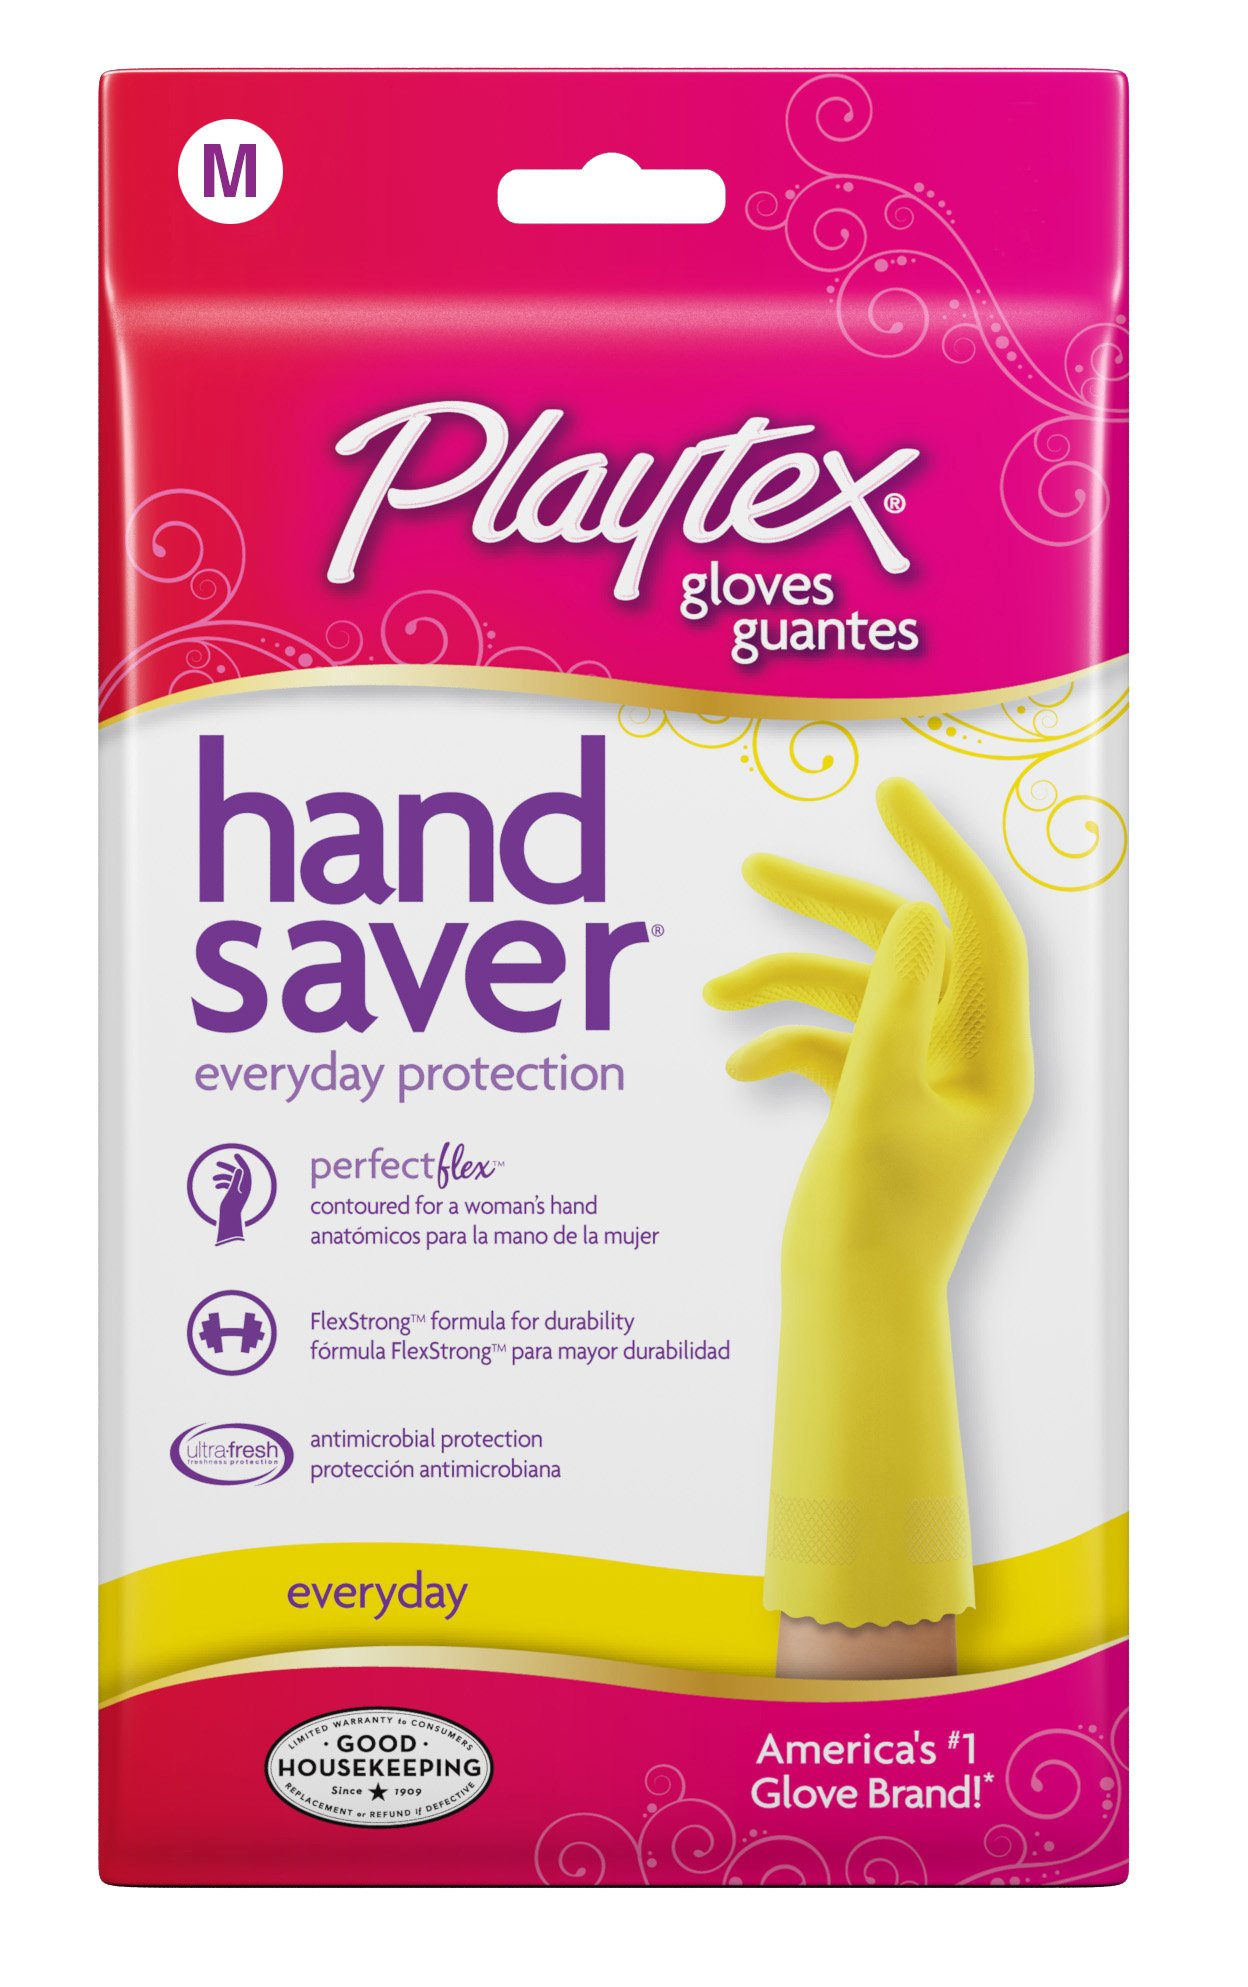 Playtex Hand Saver Premium Latex Rubber Gloves, Medium (Pack of 6) by Playtex